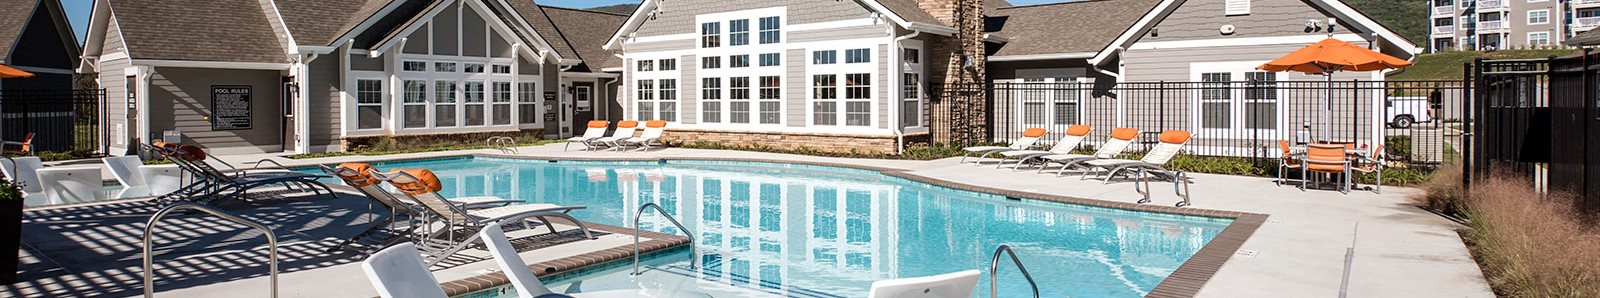 Luxurious Apartment Community at The Retreat Apartments, Virginia